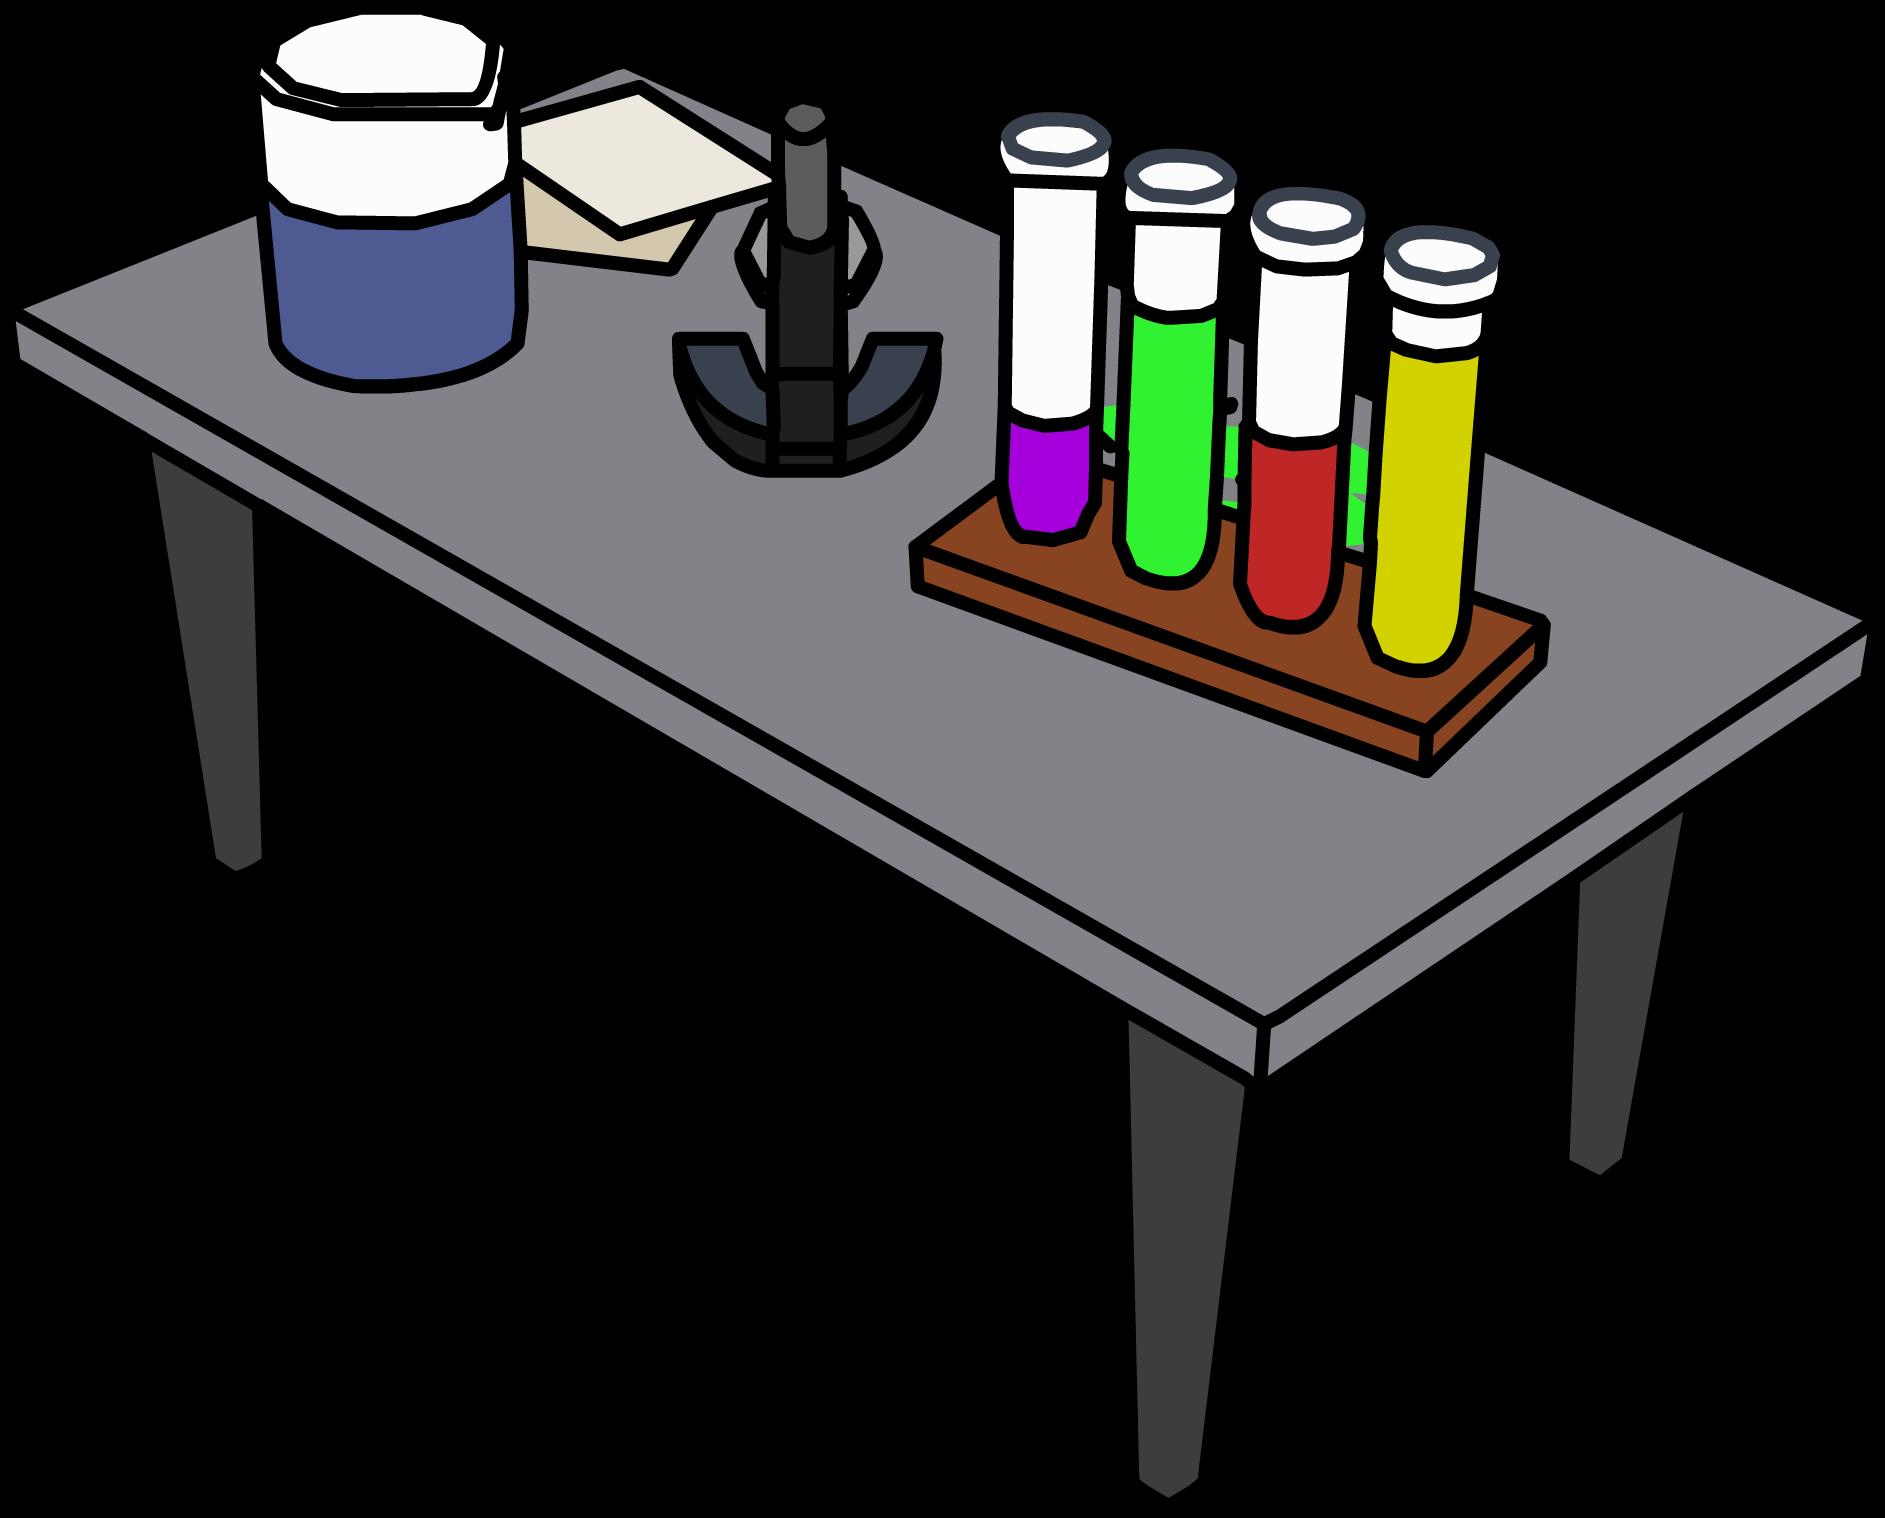 Clipart desk testing. Laboratory table clip art